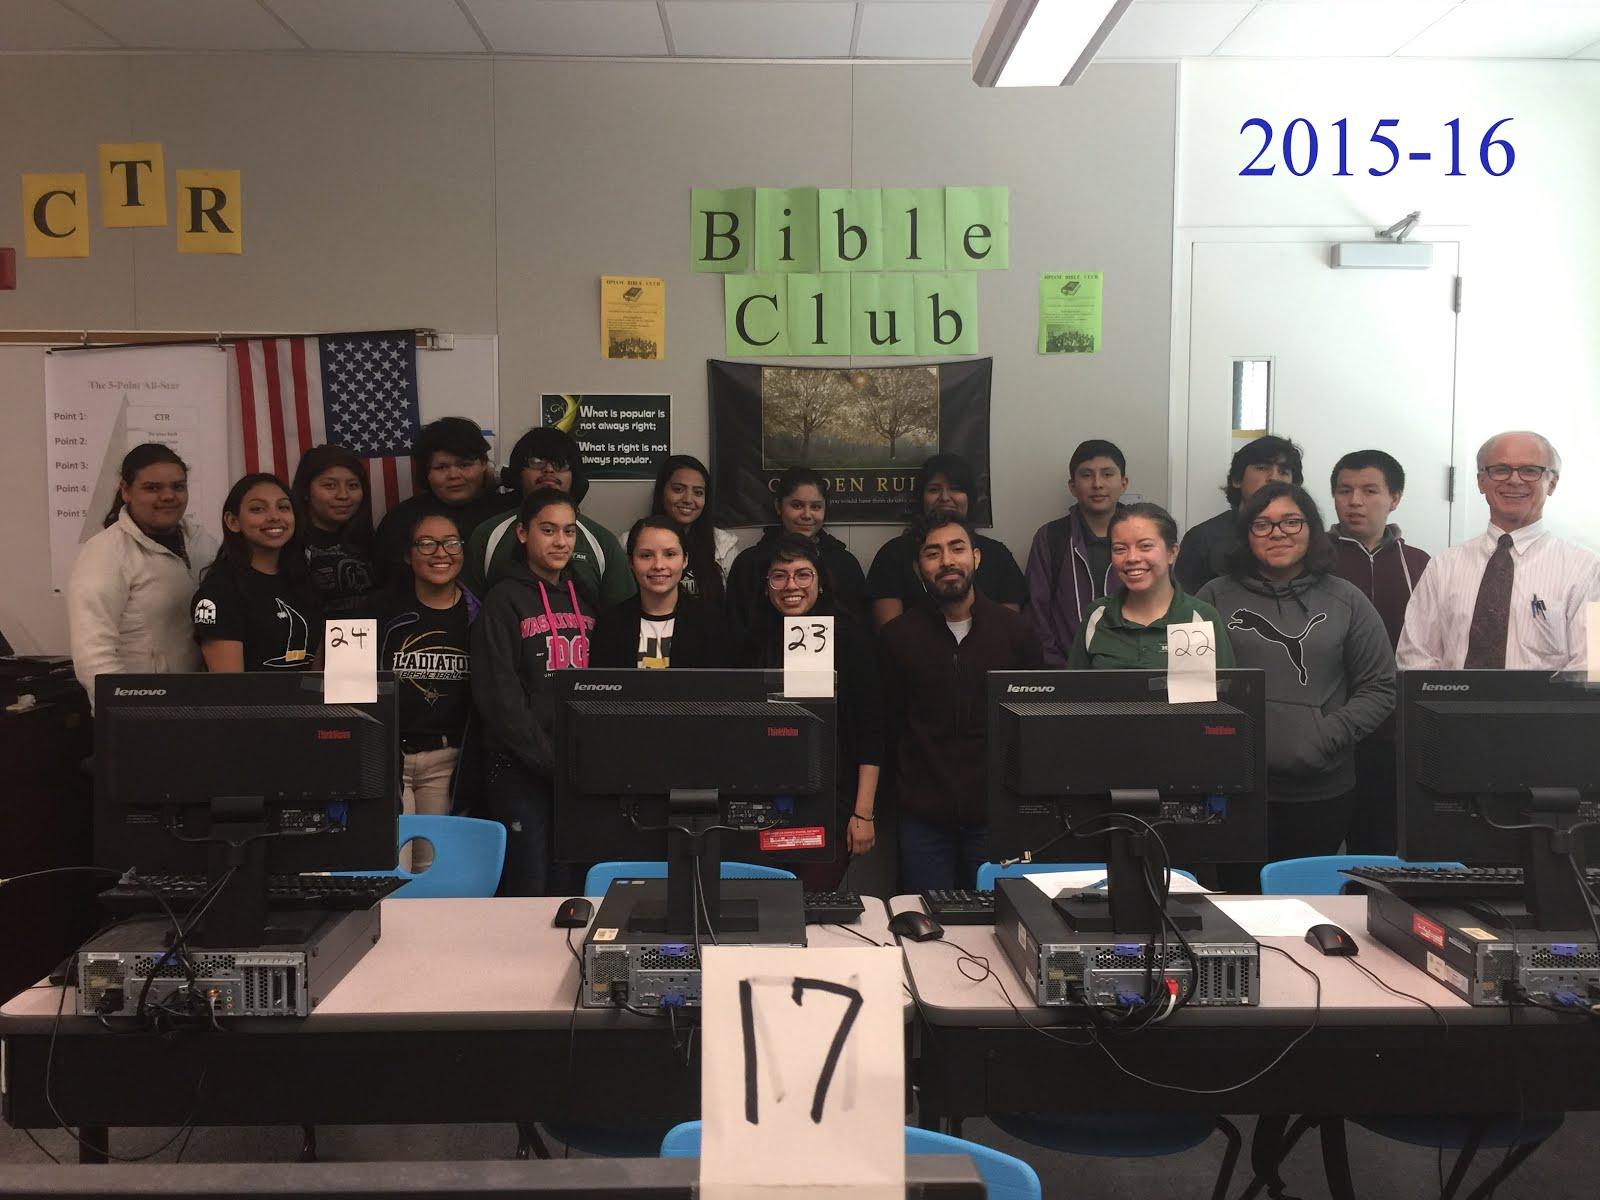 Bible Club Members 2015-16